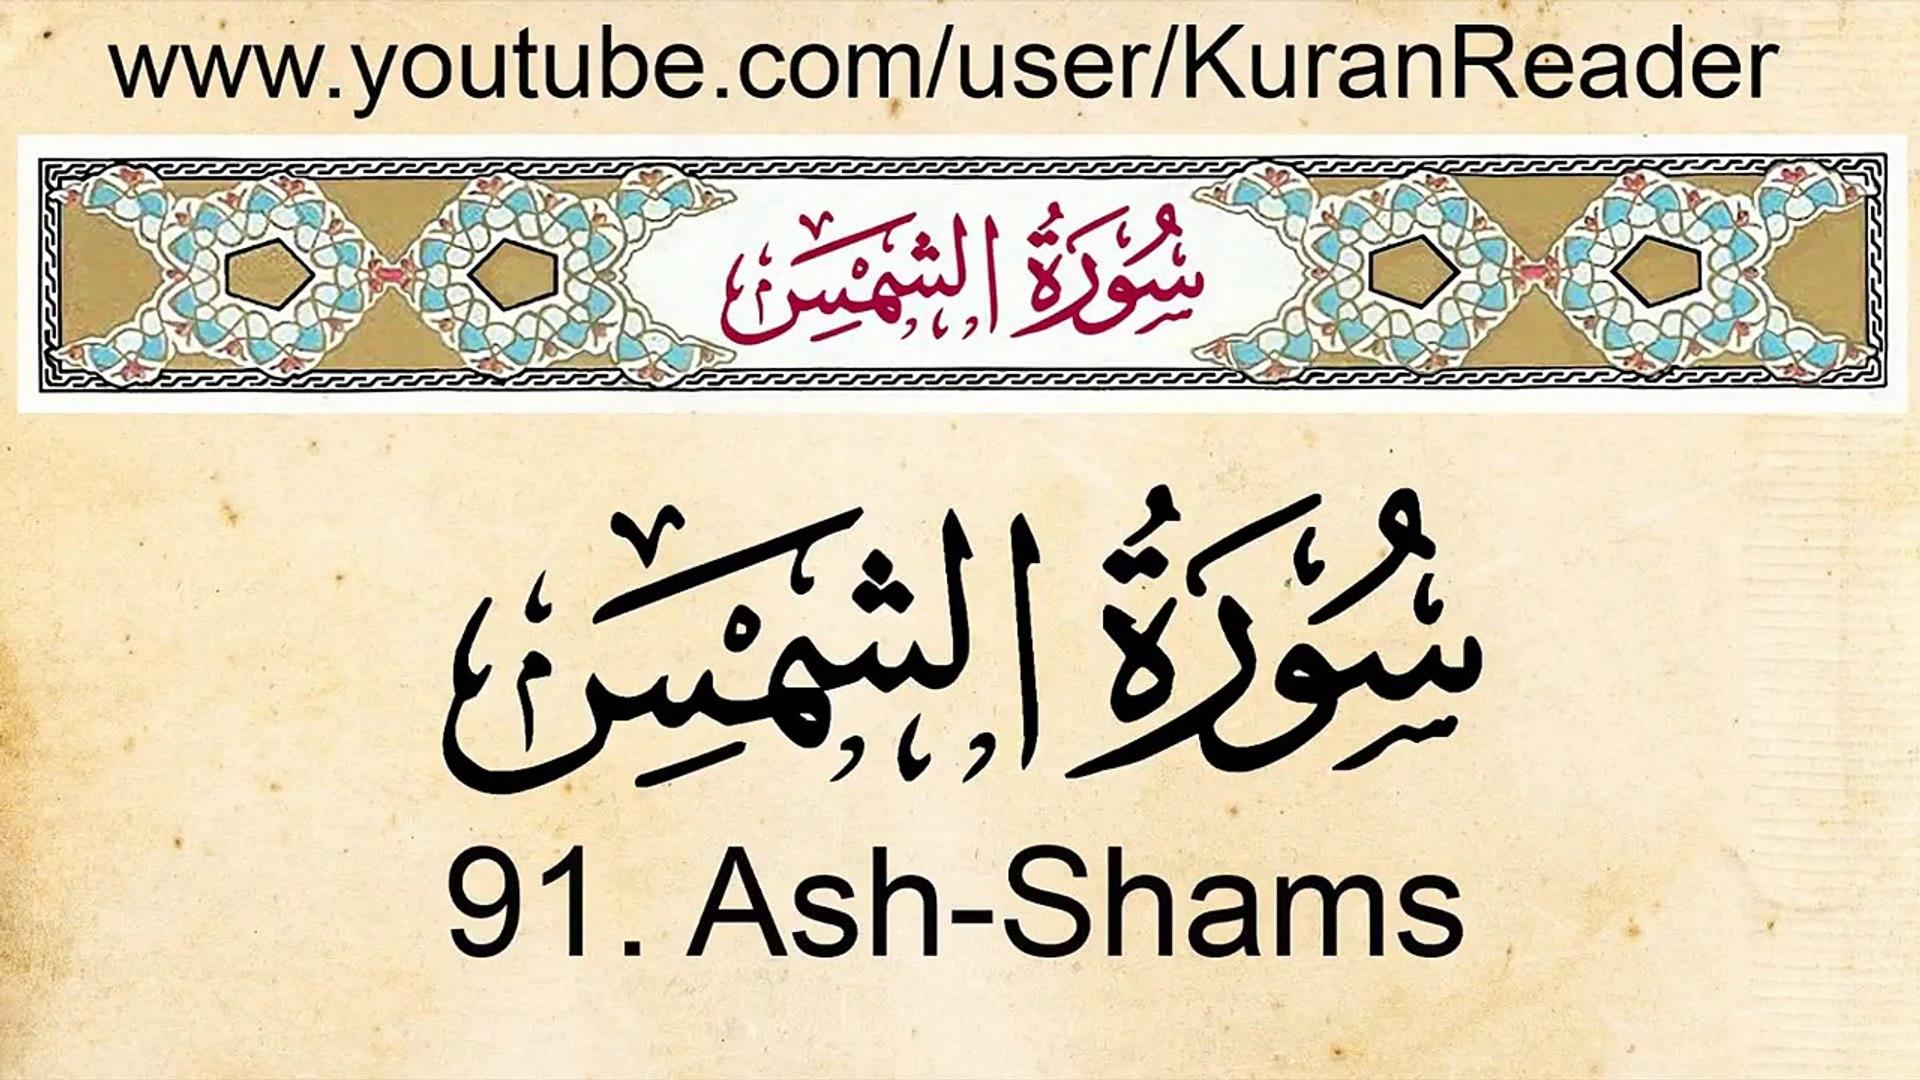 Quran 91 Surah Ash Shams The Sun Arabic And English Translation Hd Video Dailymotion